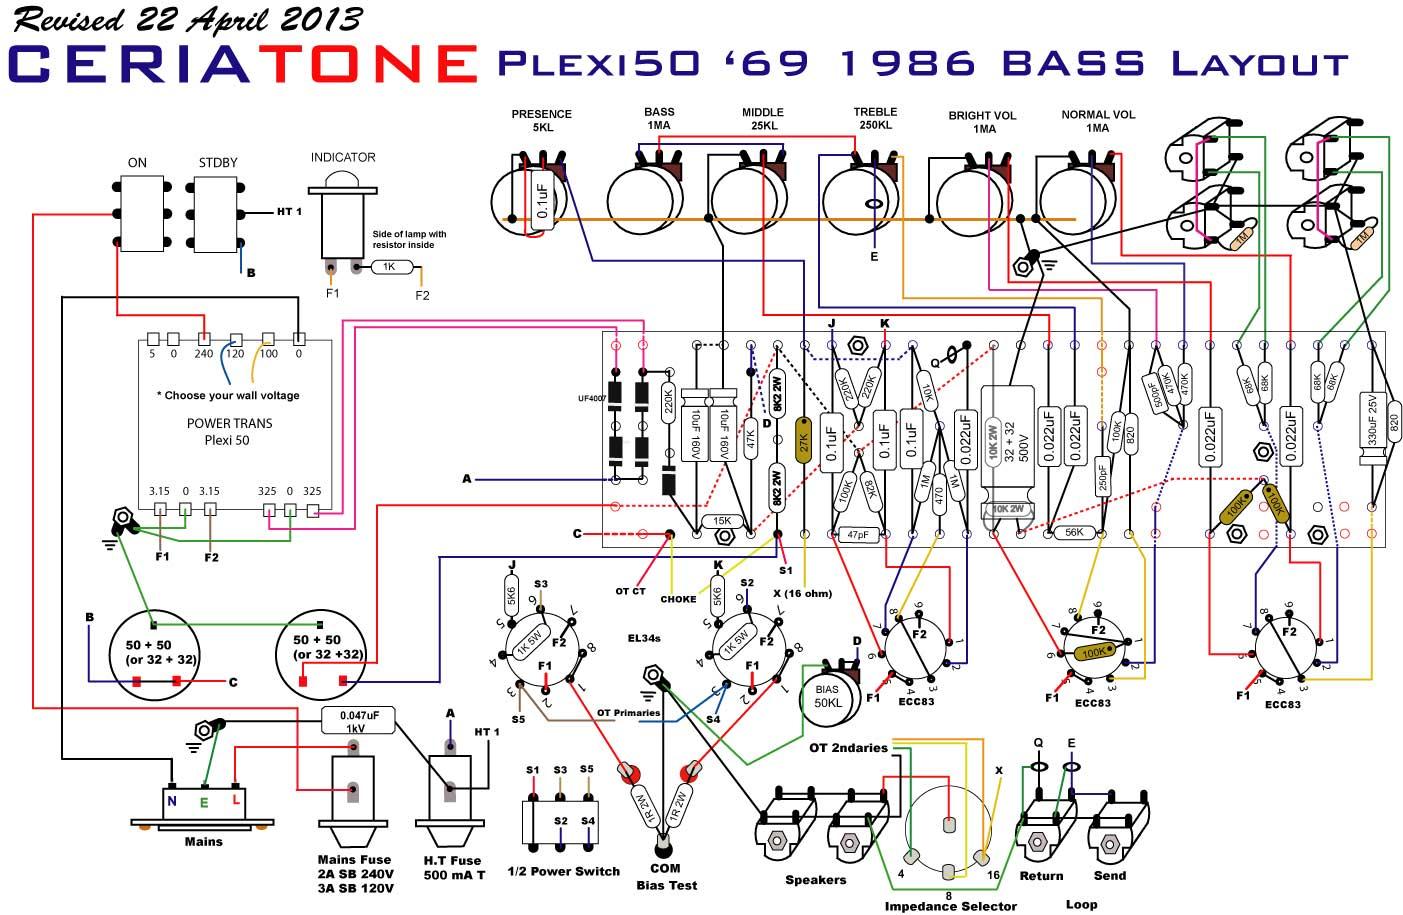 Ceriatoneusa Manuals And Layout Diagrams 1968 Mustang Heater Wiring Diagram